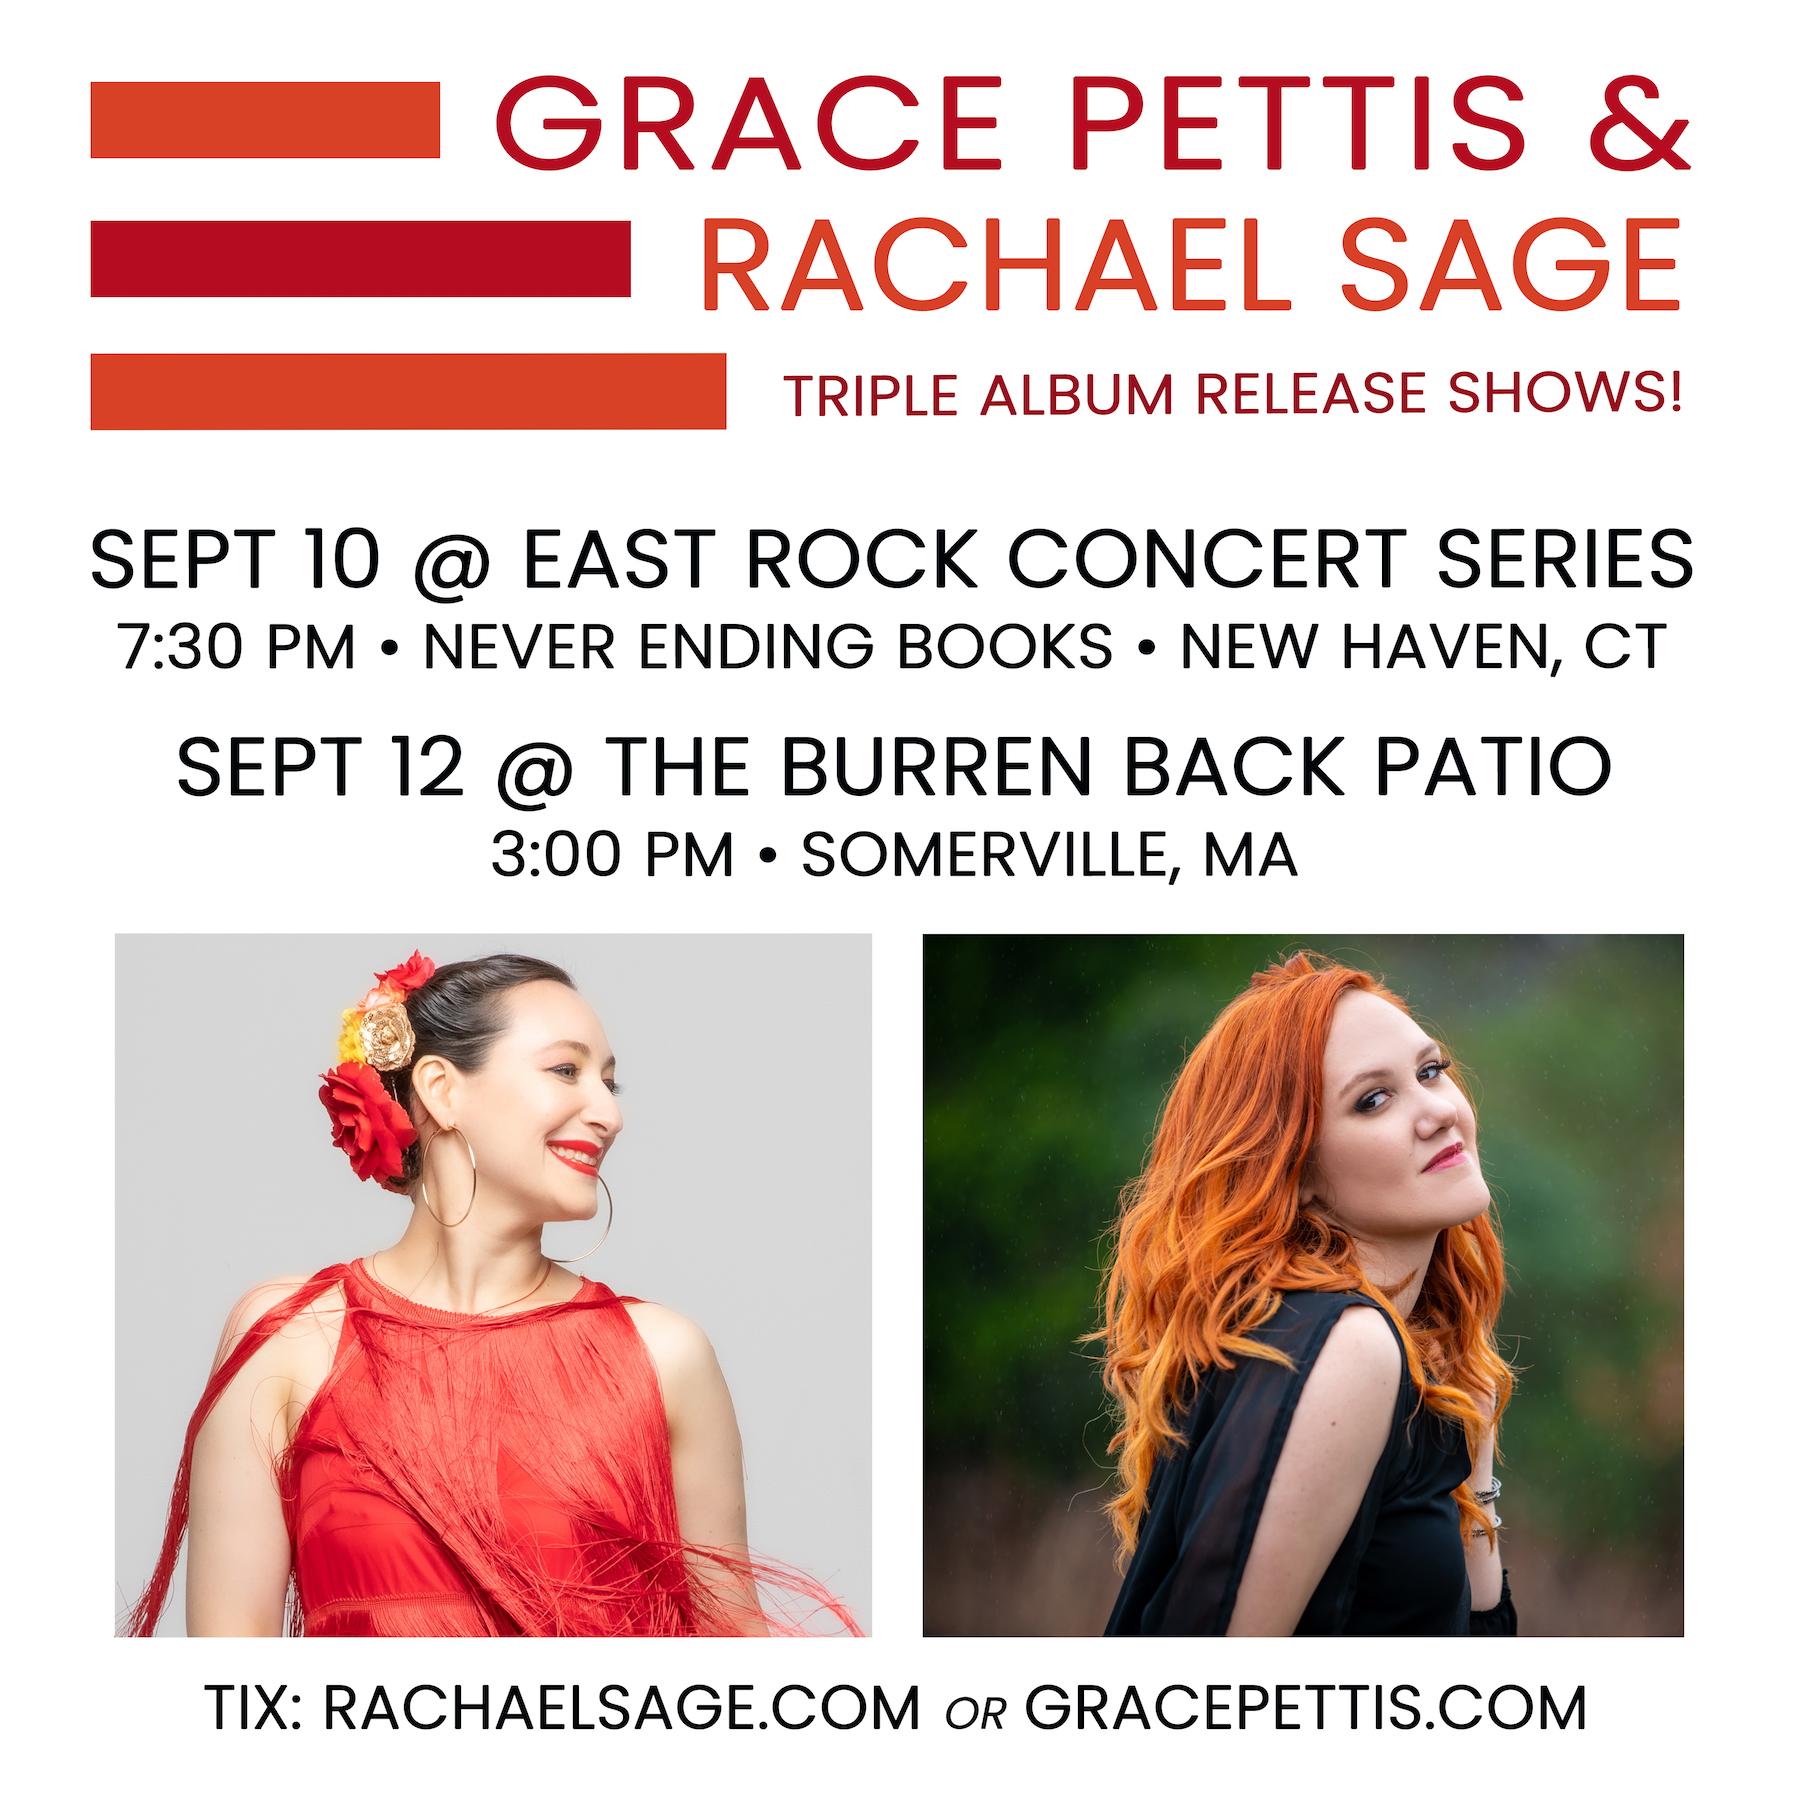 Rachael Sage Shows with Grace Pettis